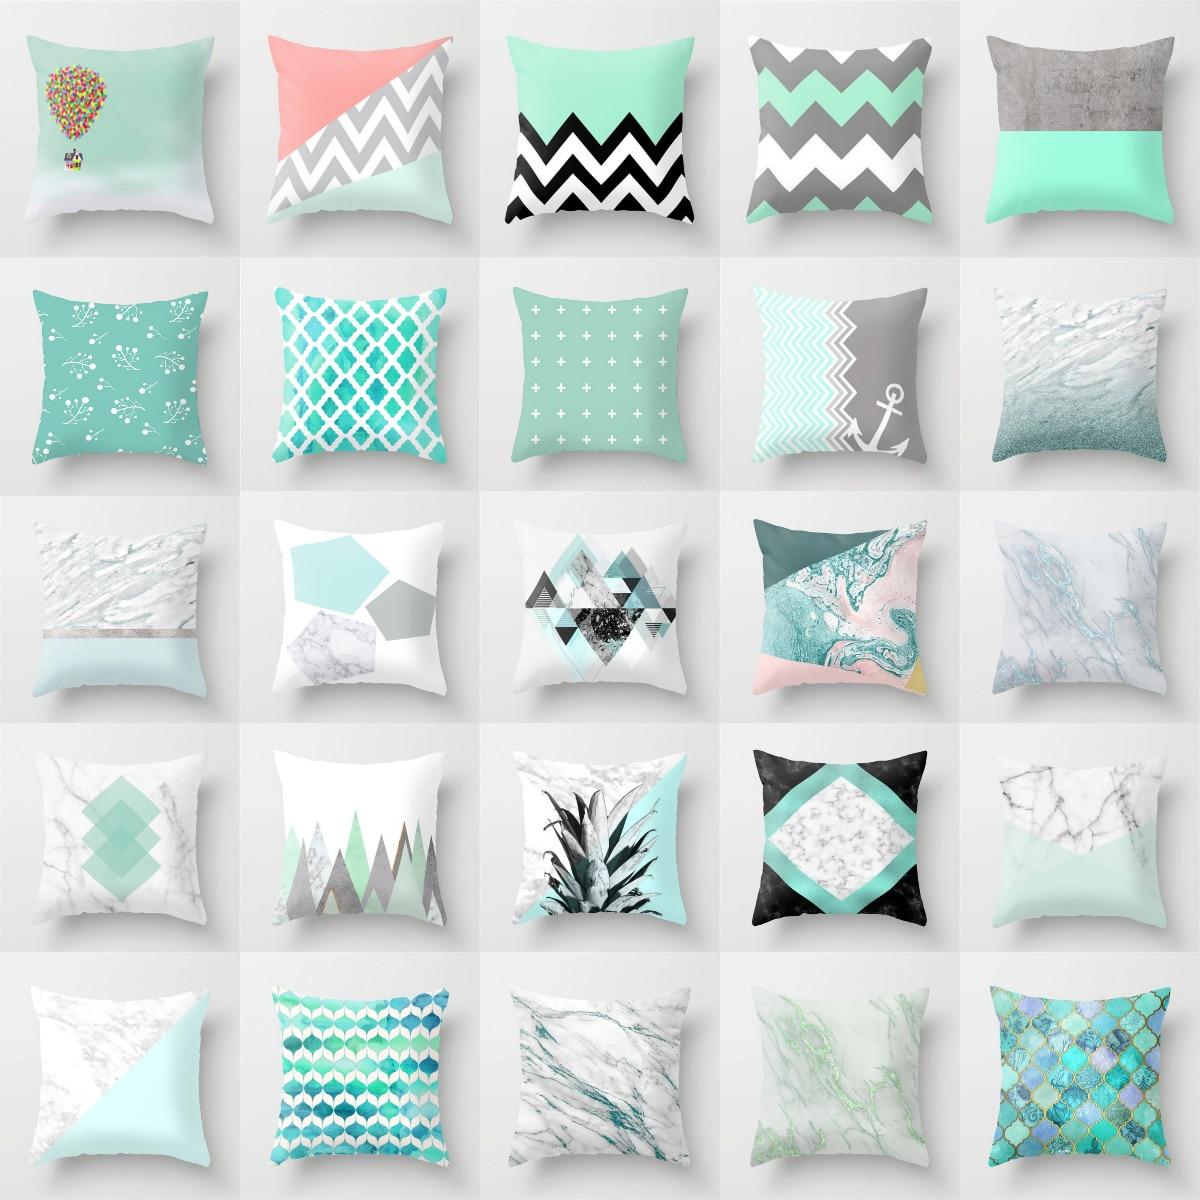 New 45x45cm Blue Green Geometric Cushion cover For Sofa Home Decor Polyester Cotton Throw Pillow Case Marble Texture Pillowcase